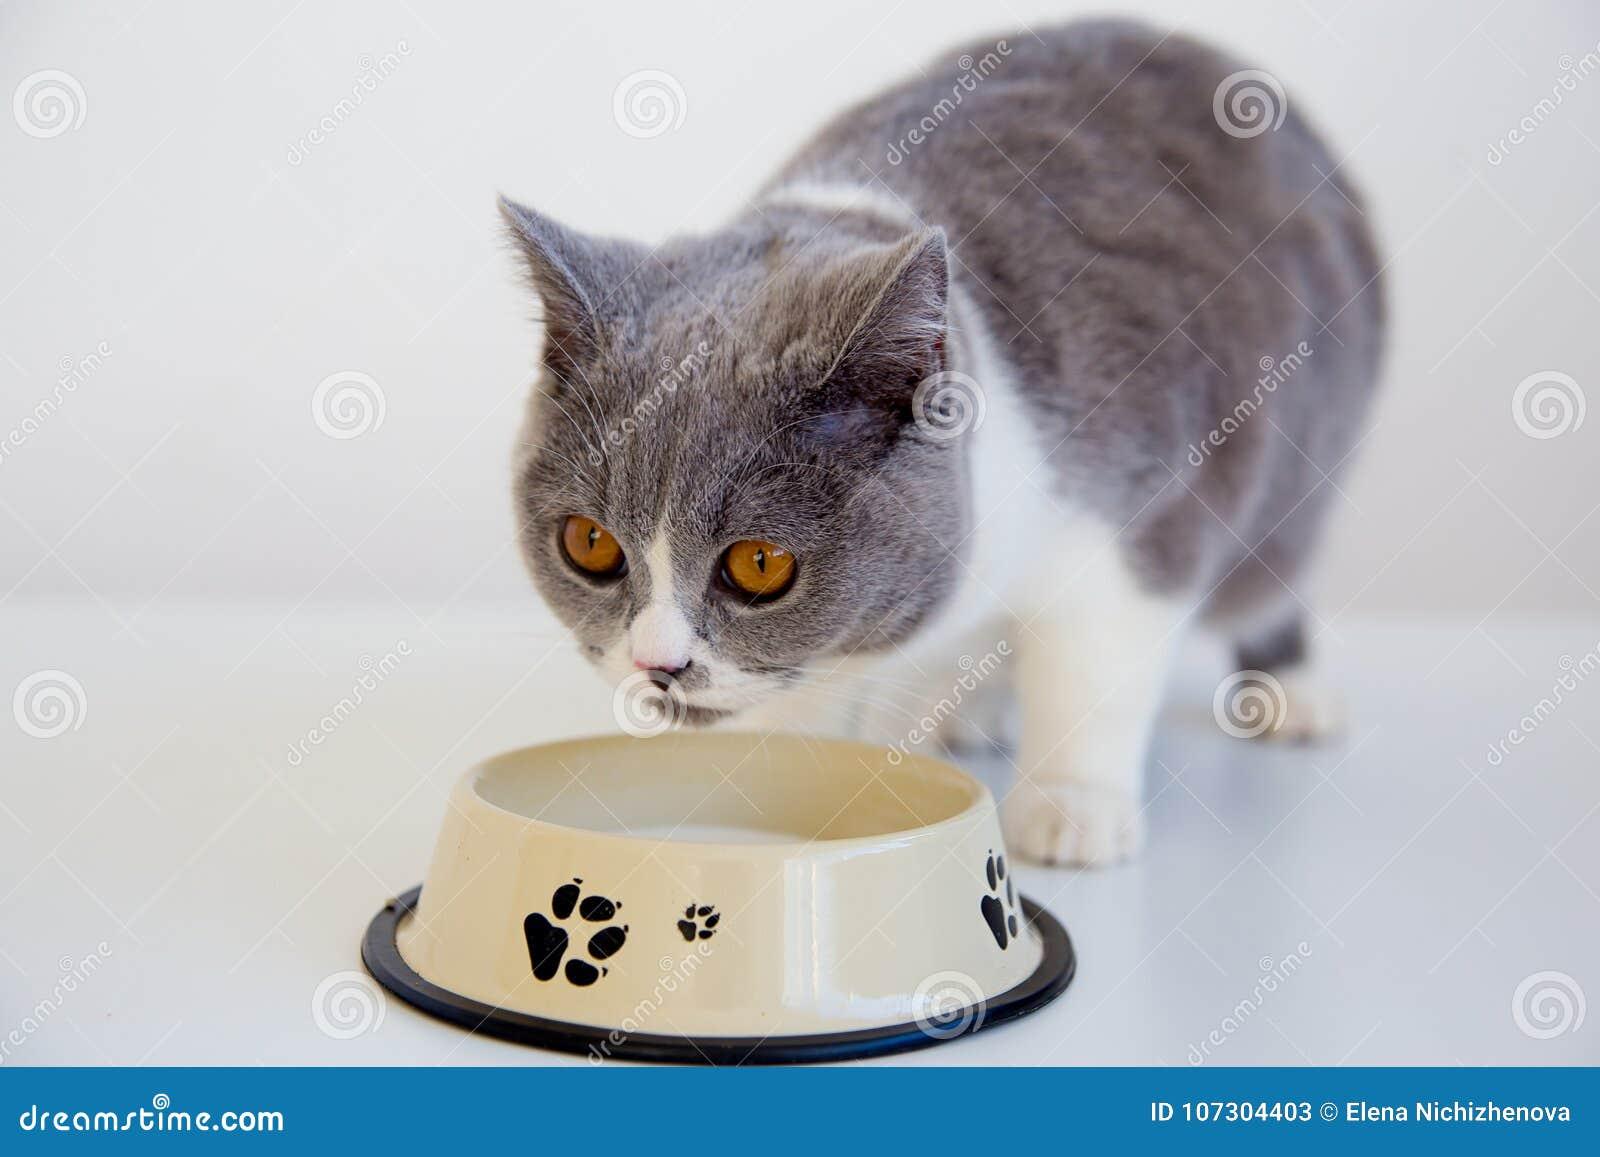 Cat eating his food